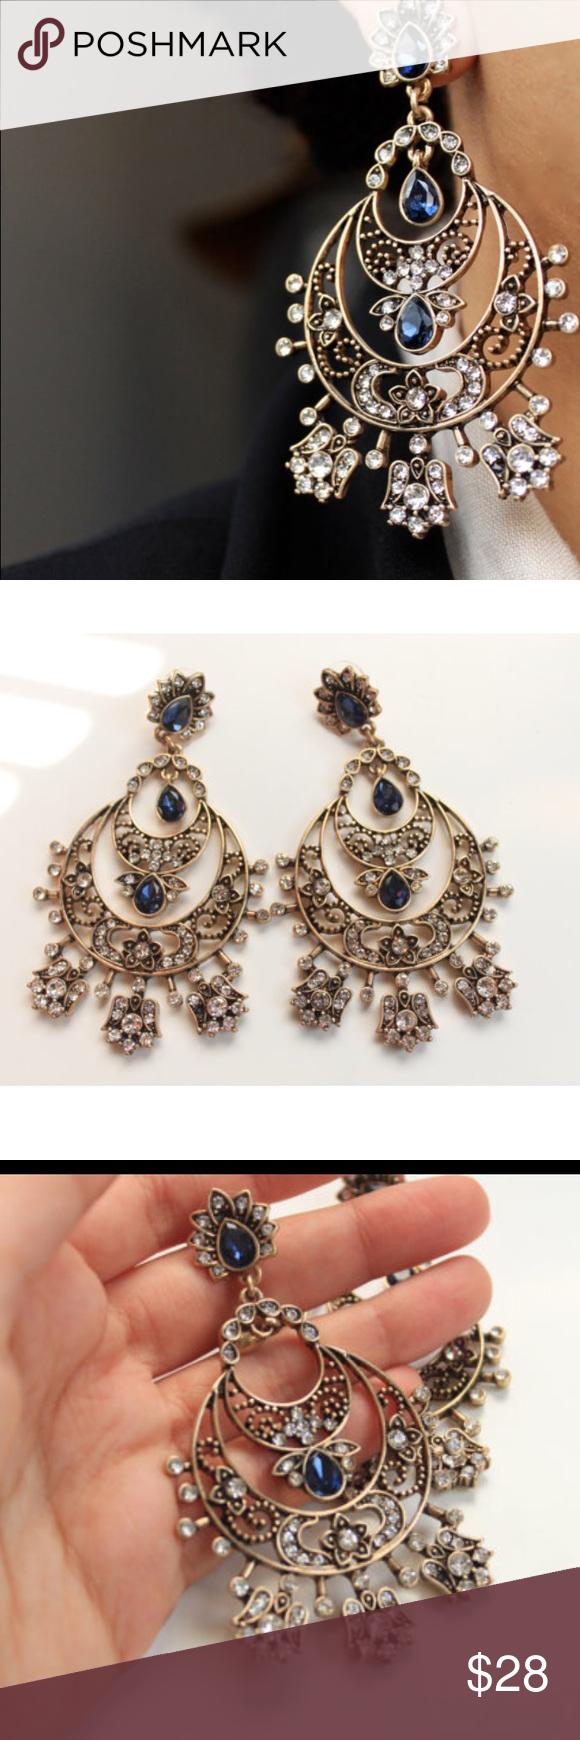 Antique gold chandelier earrings Boutique | Gold chandelier ...